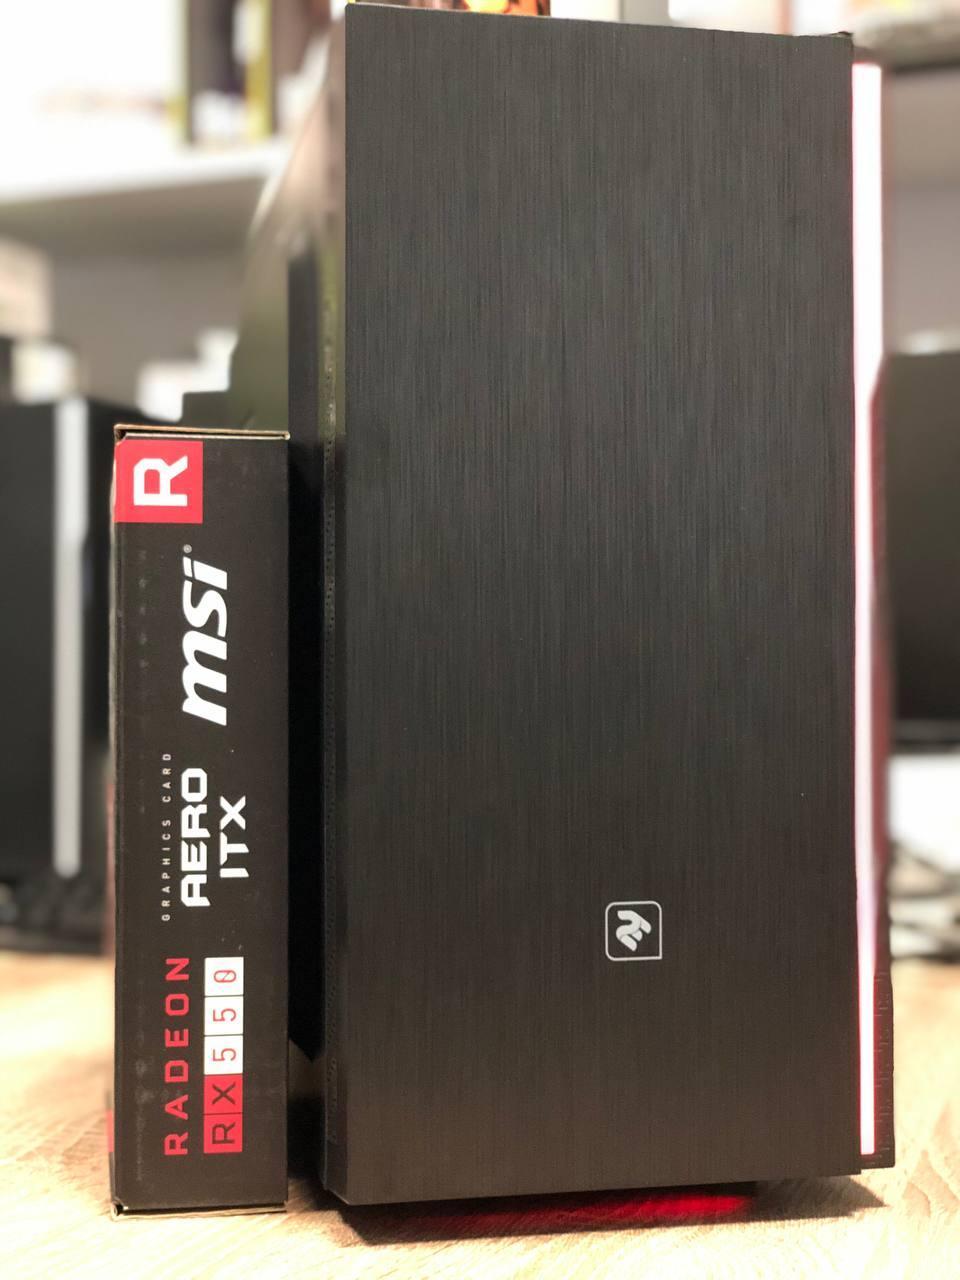 Игровой компьютер Basis Intel Core i5-3470 RAM 8GB  HDD 500GB RX 550 2GB